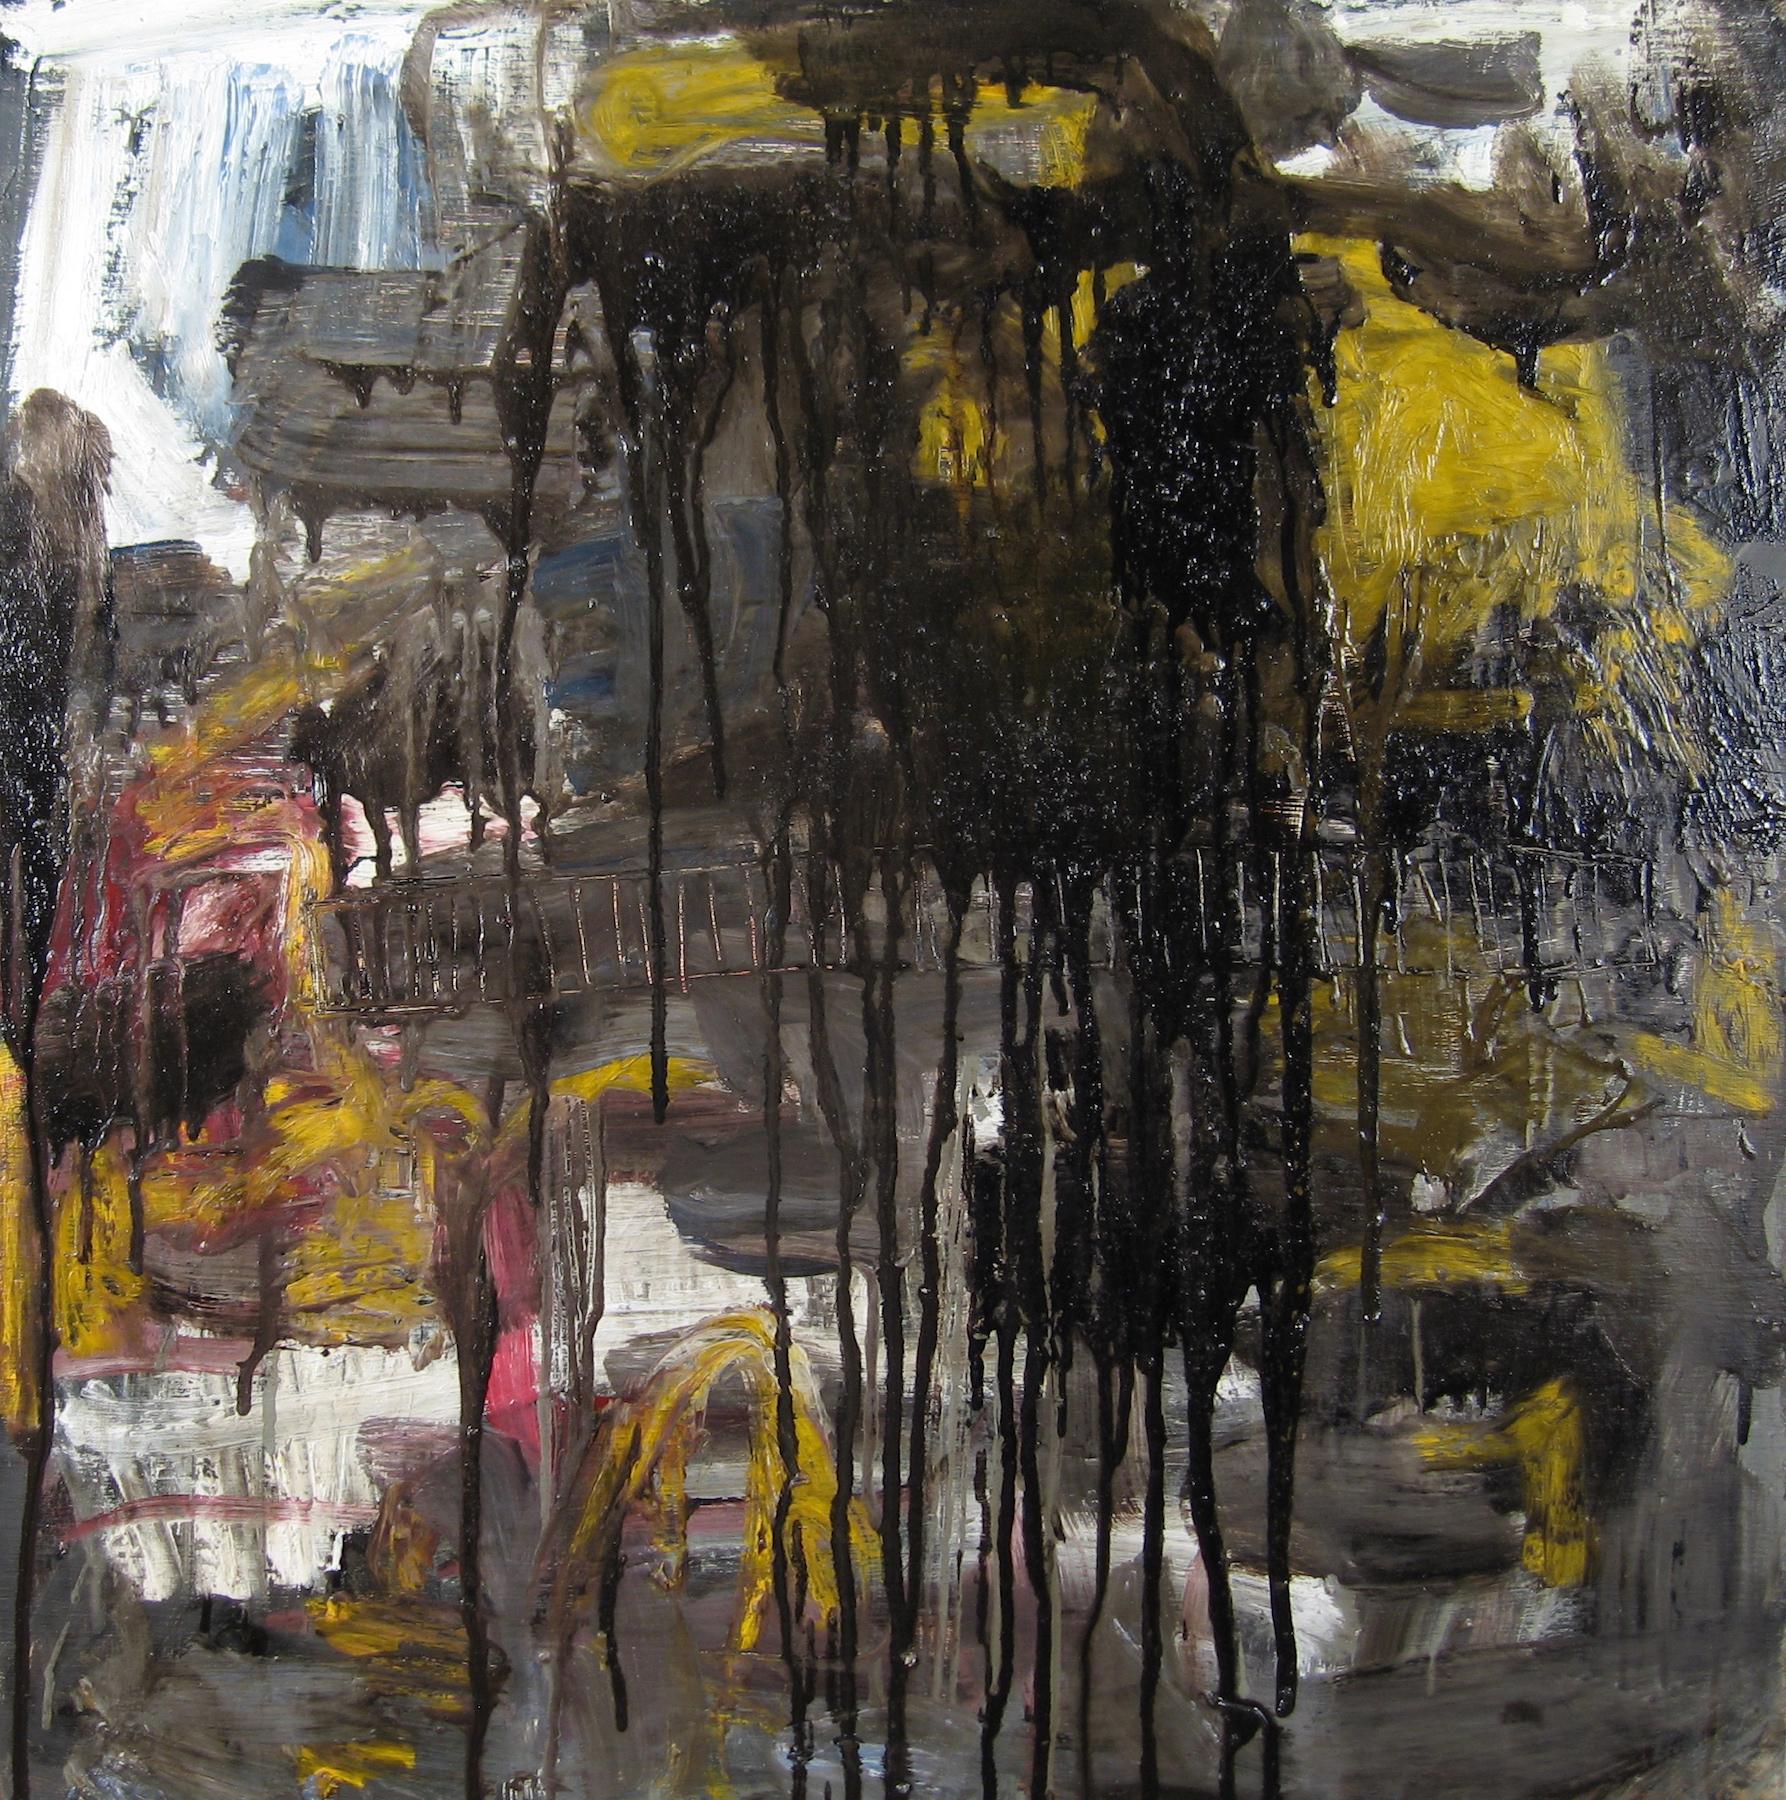 Leslie Zelamsky, Ayeka IV: Where Are You?, mixed media, 24x24, $1,500